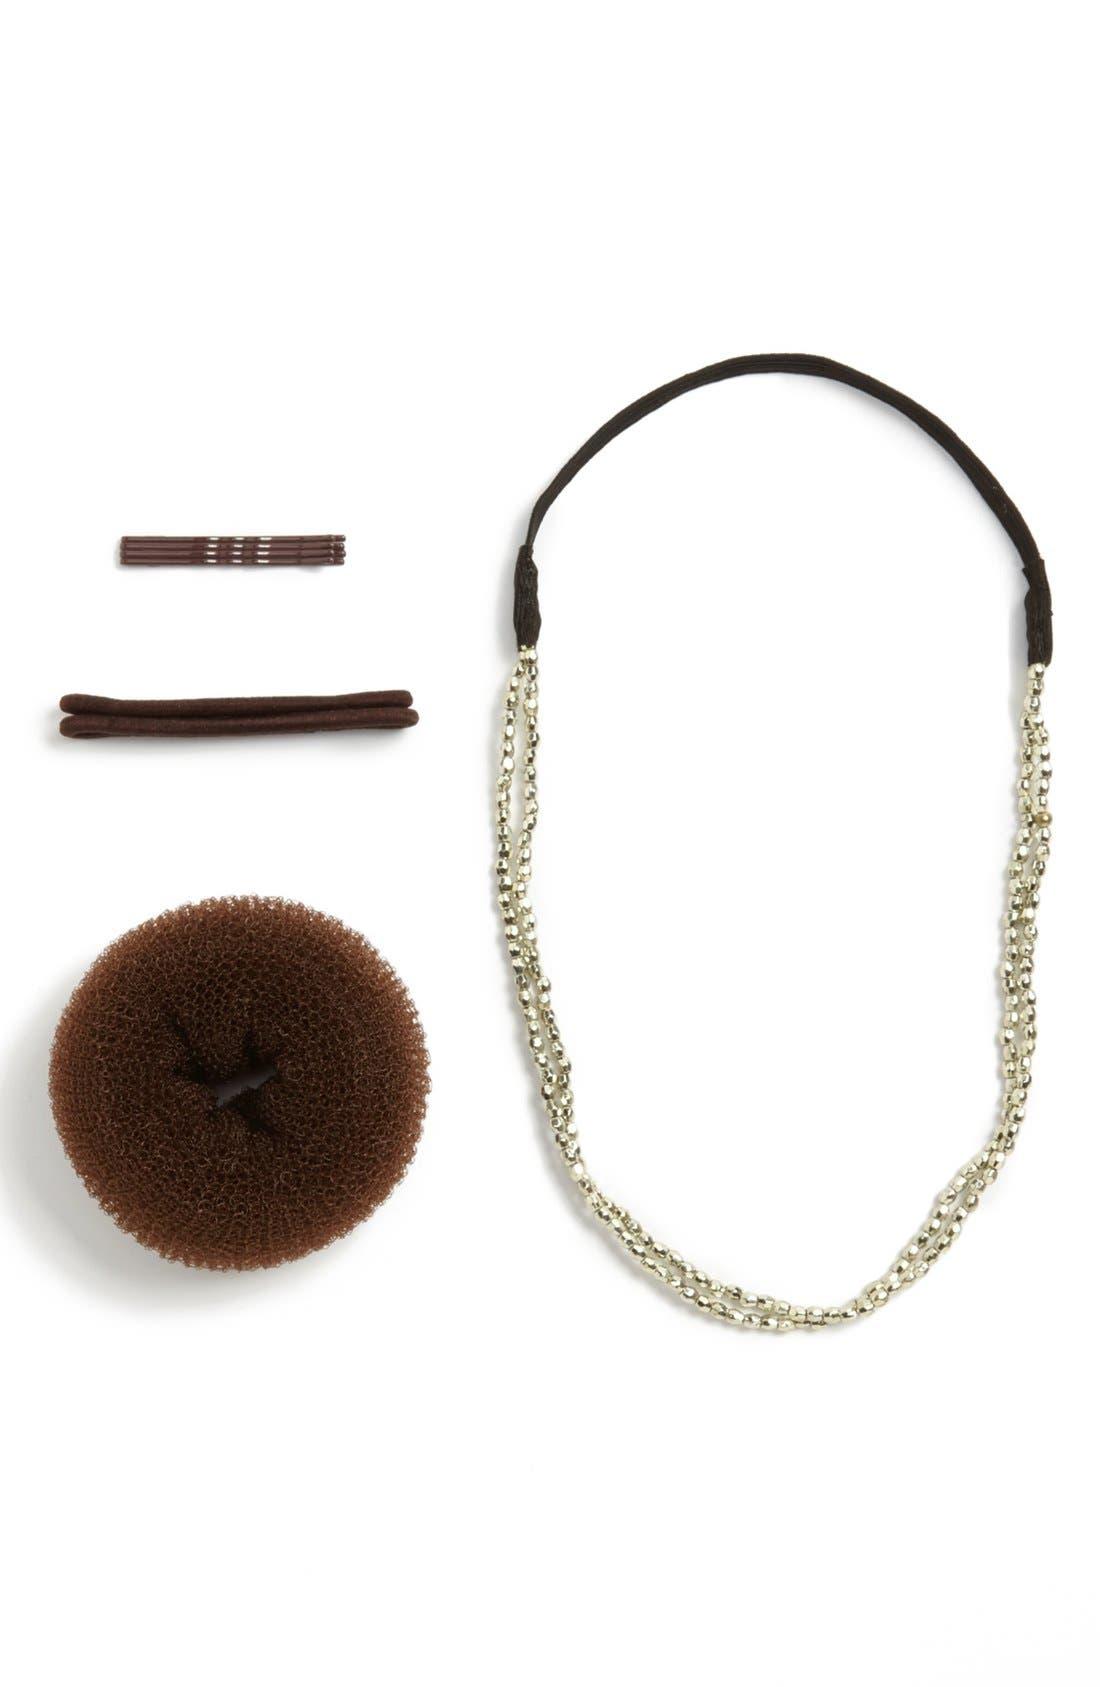 Main Image - Capelli of New York Headband & Bun Shaper Kit (Juniors) (Online Only)